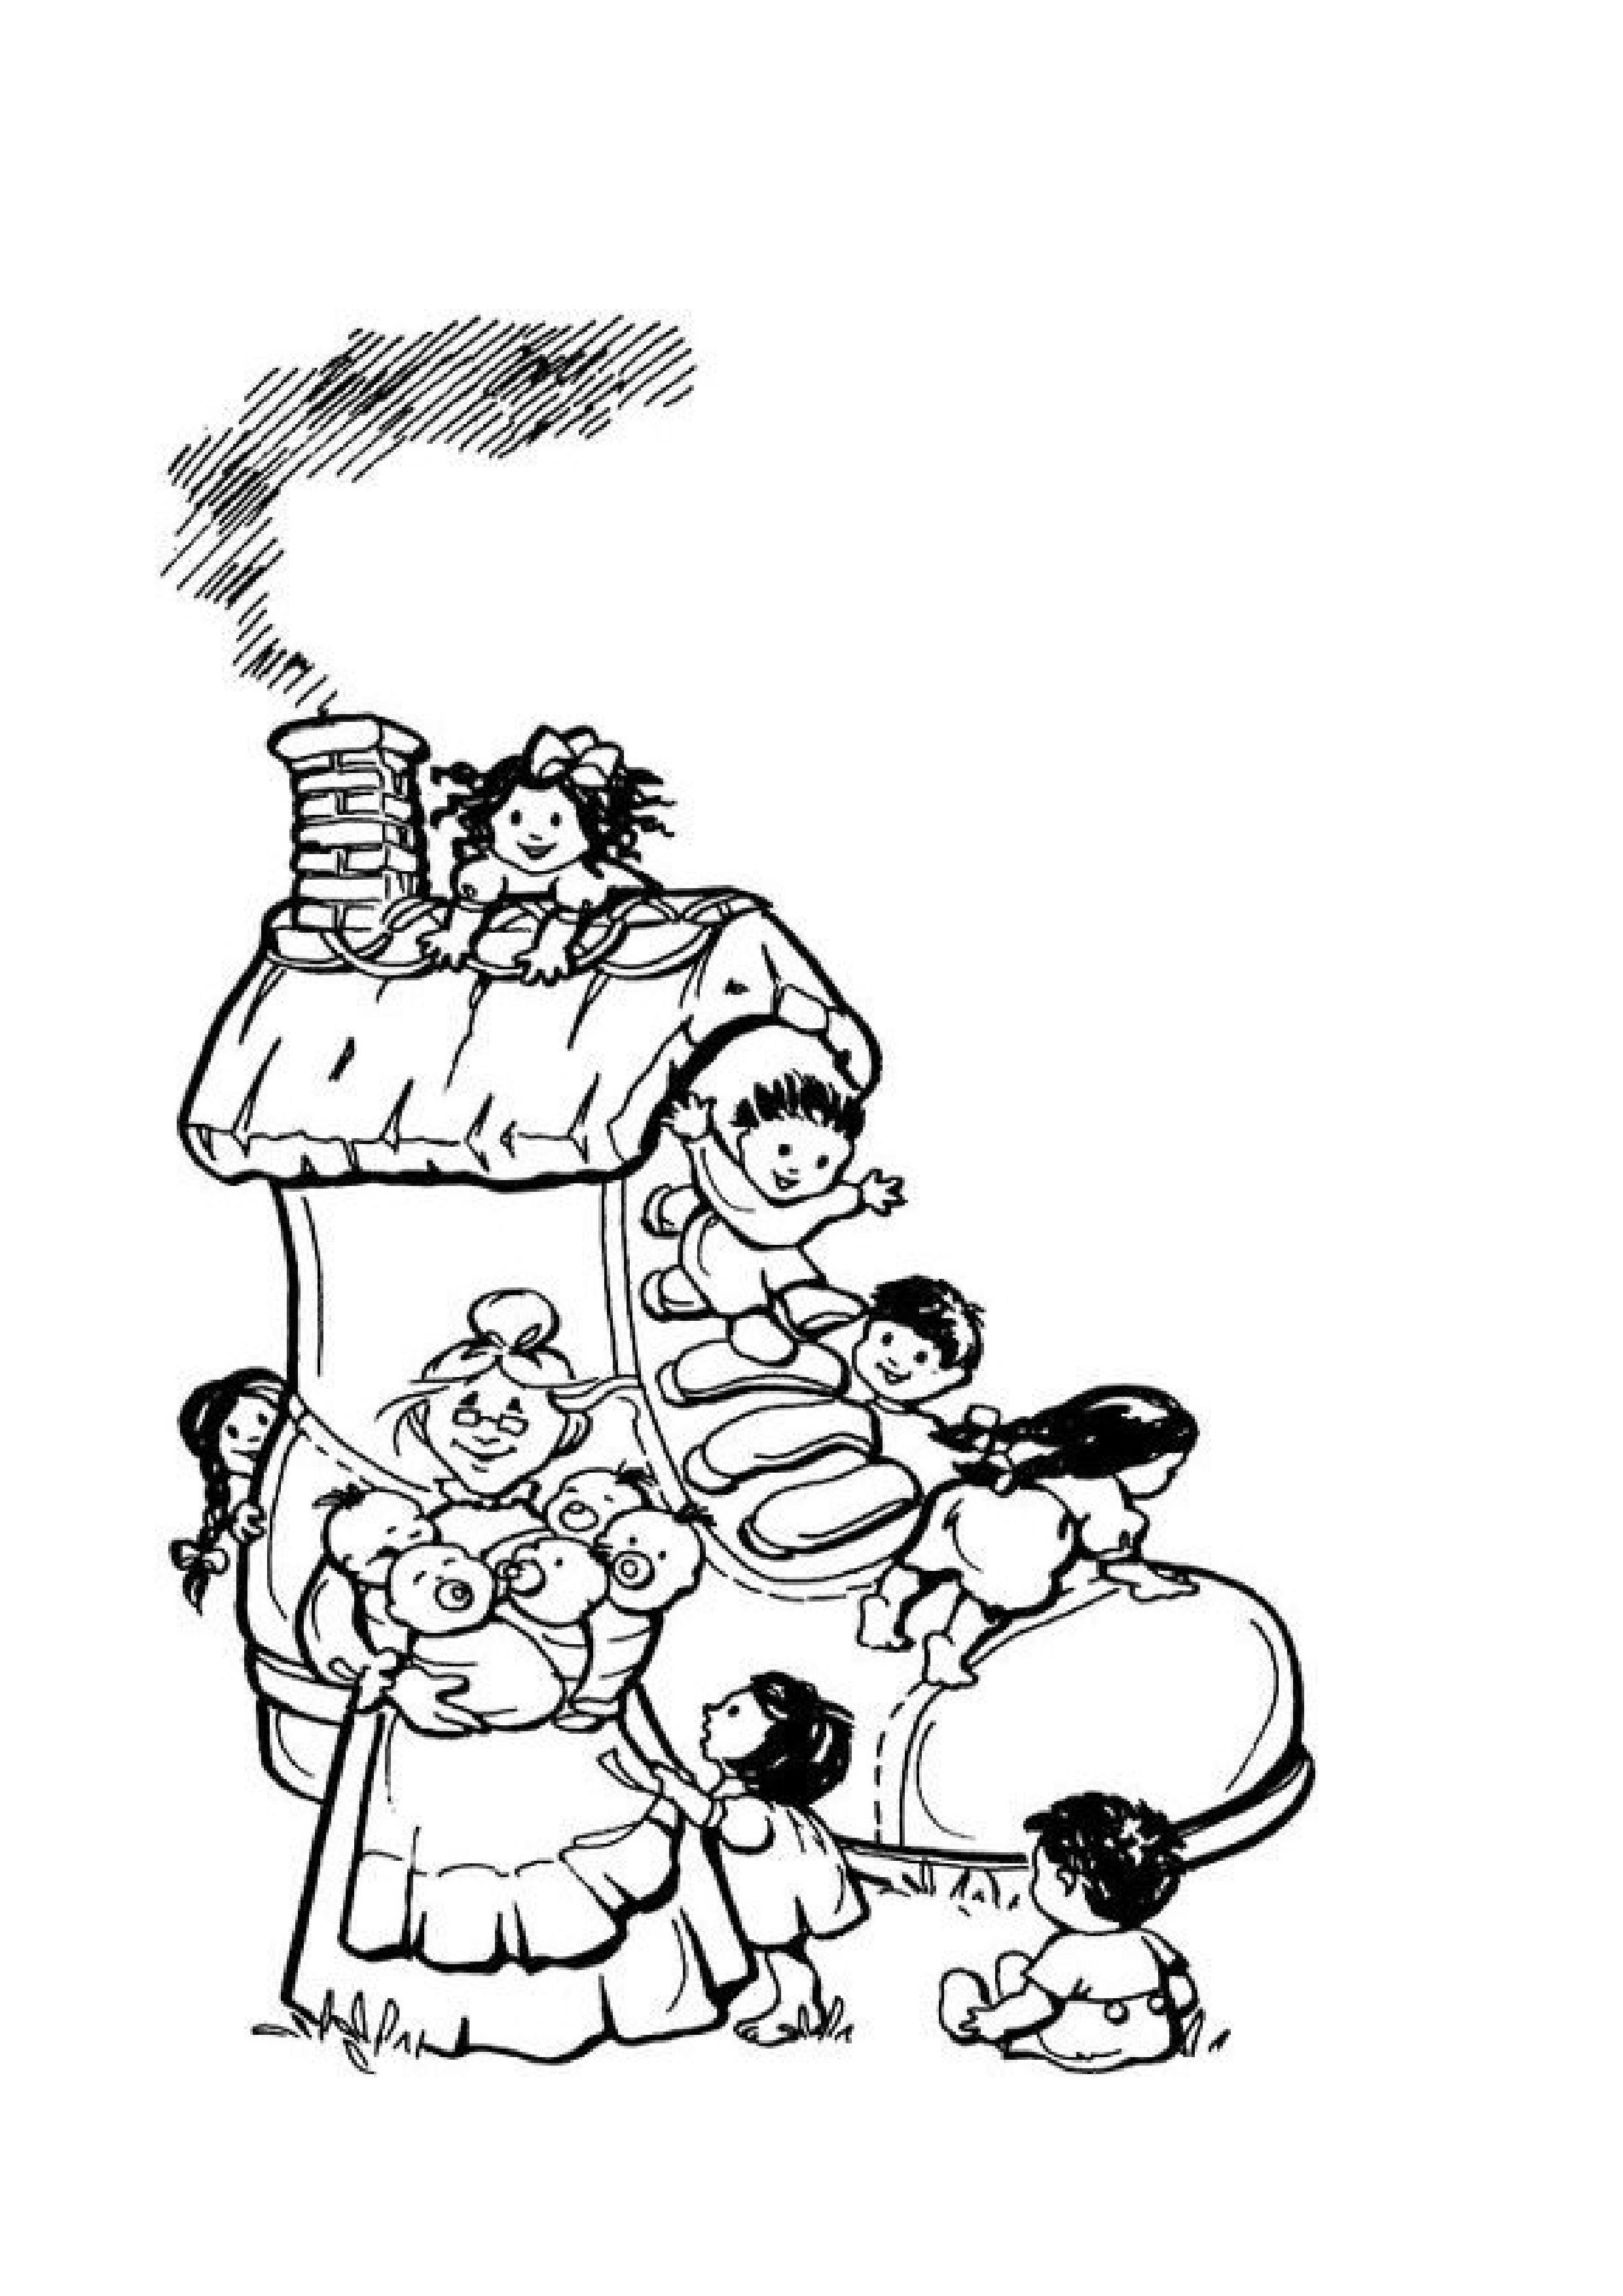 Nursery-Rhymes-Coloring-Pages14.jpg (2479×3508) | camping images ...